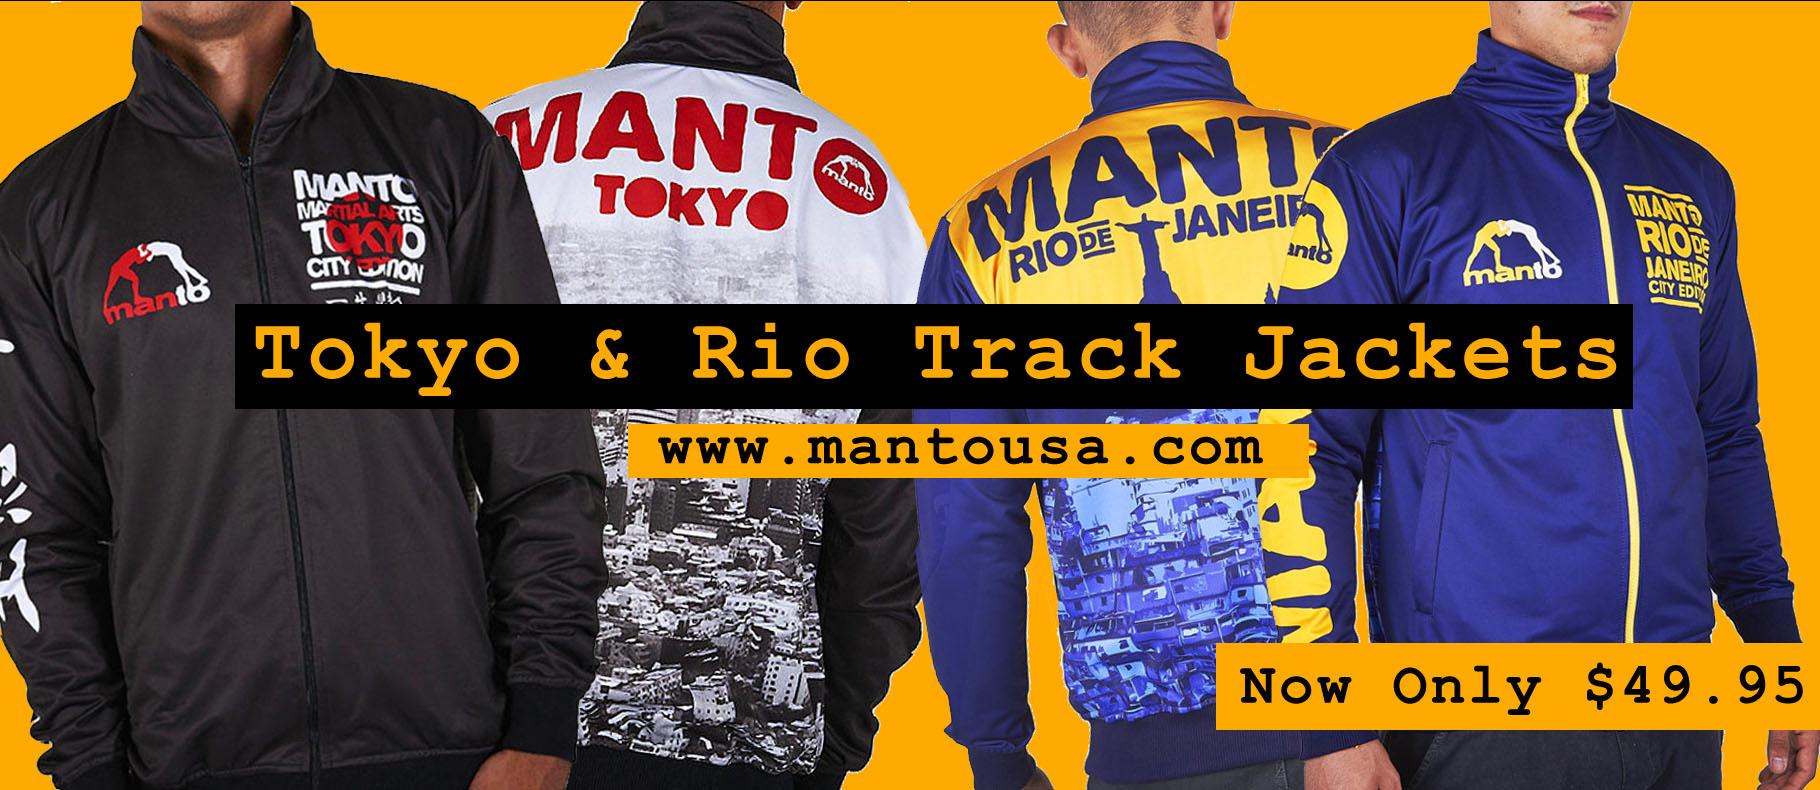 track-jackets-sale.jpg